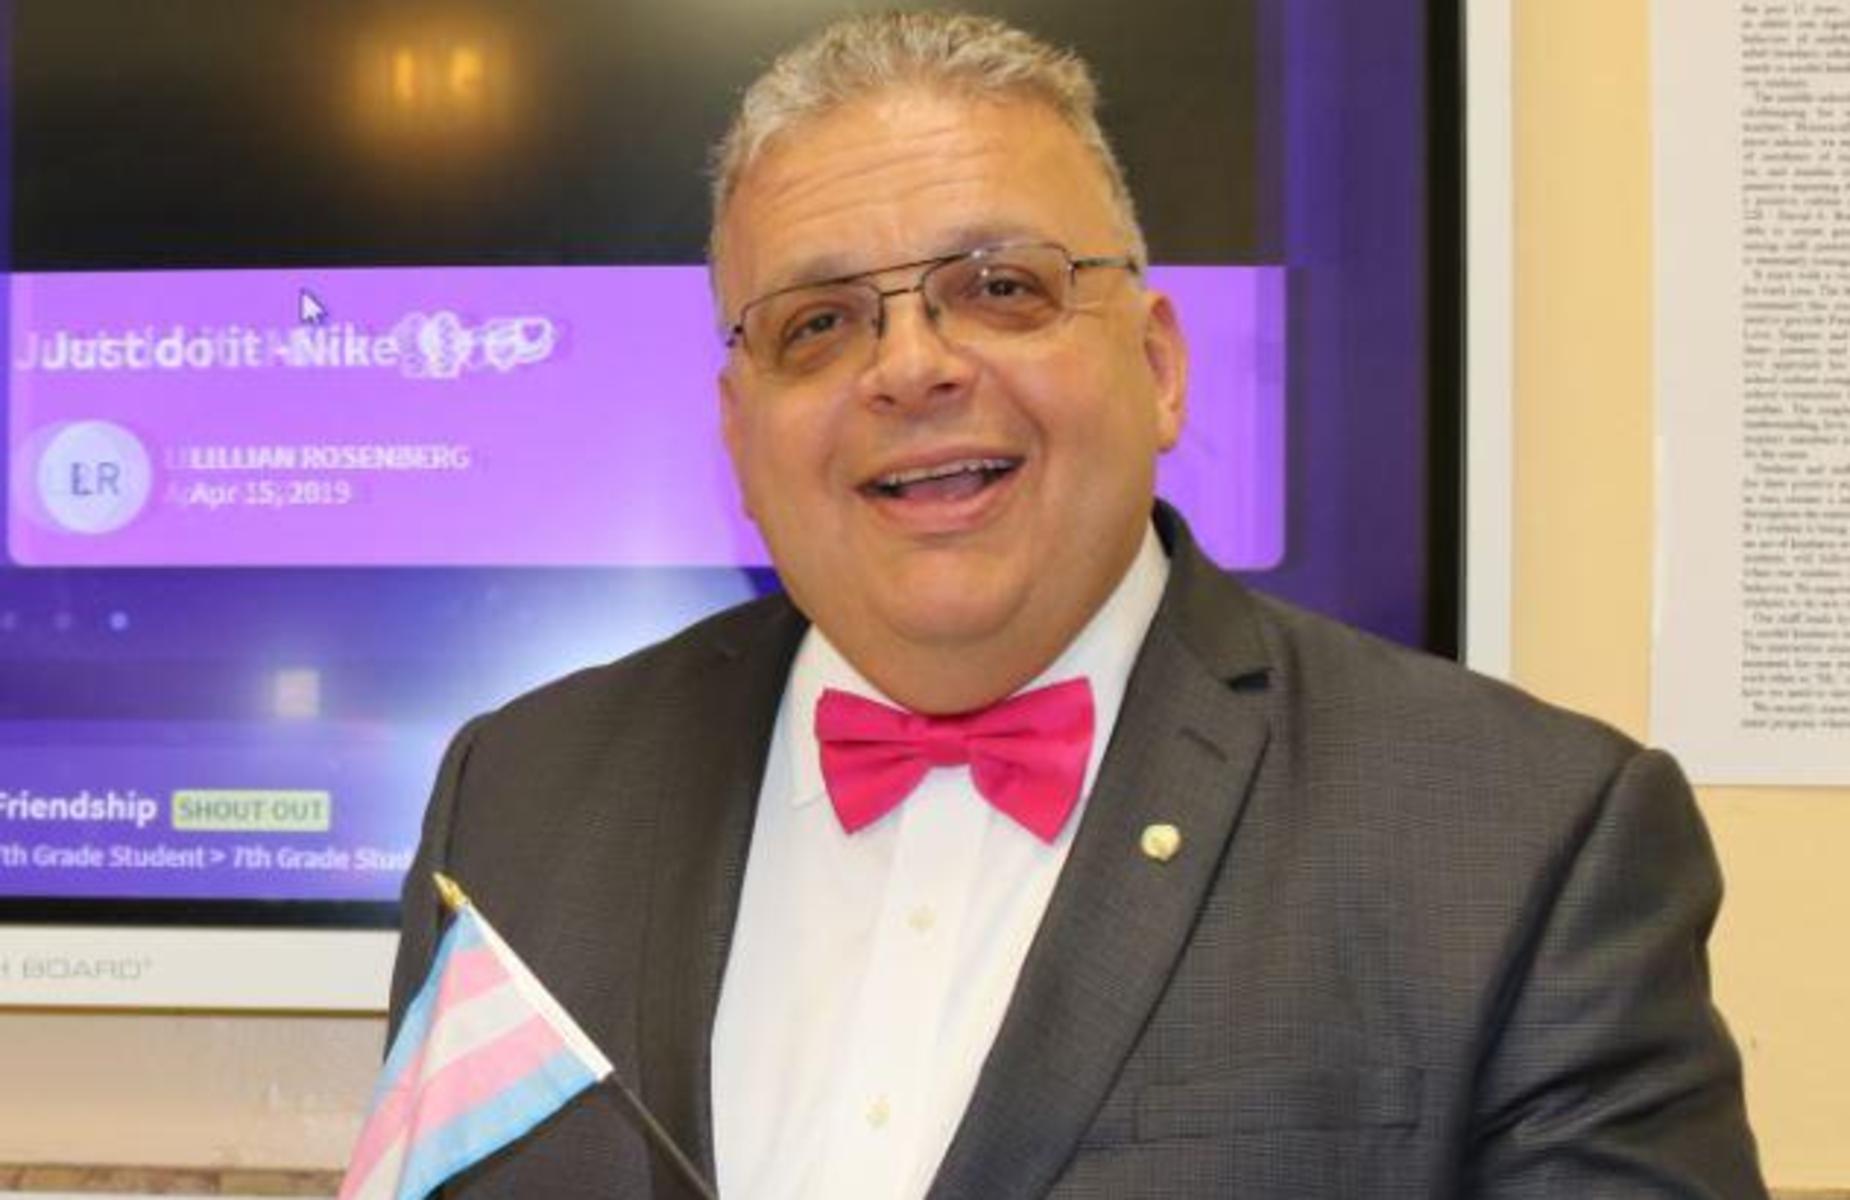 Mr. D'Angelo proudly holding the Transgender flag